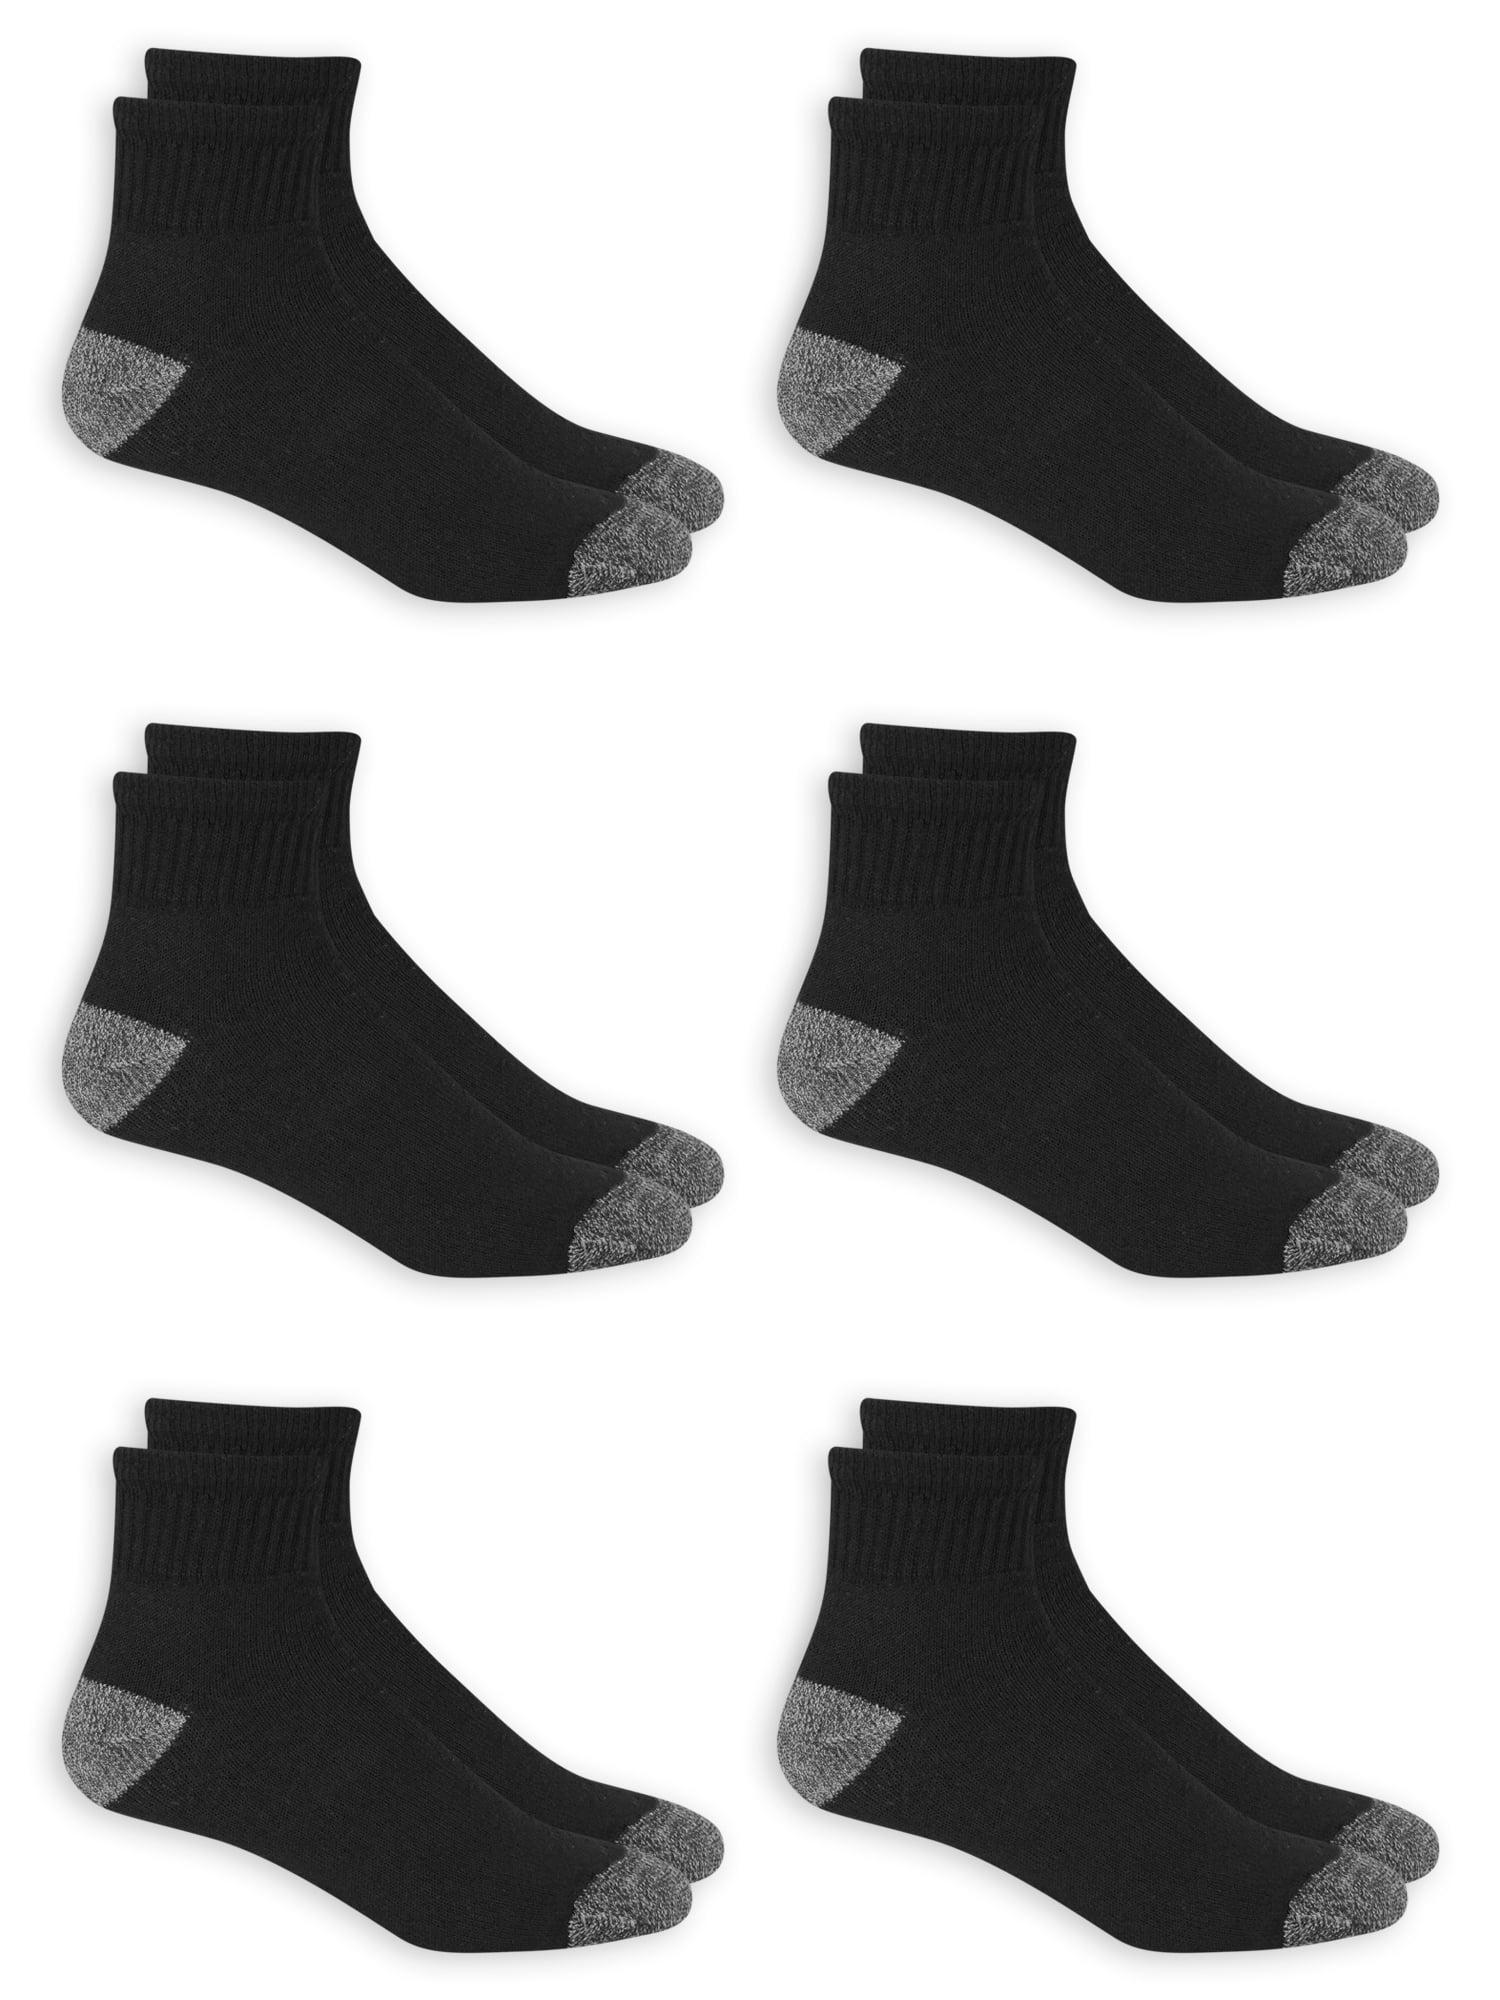 Men's Big & Tall Odor Resistant Ankle Socks 6 Pack